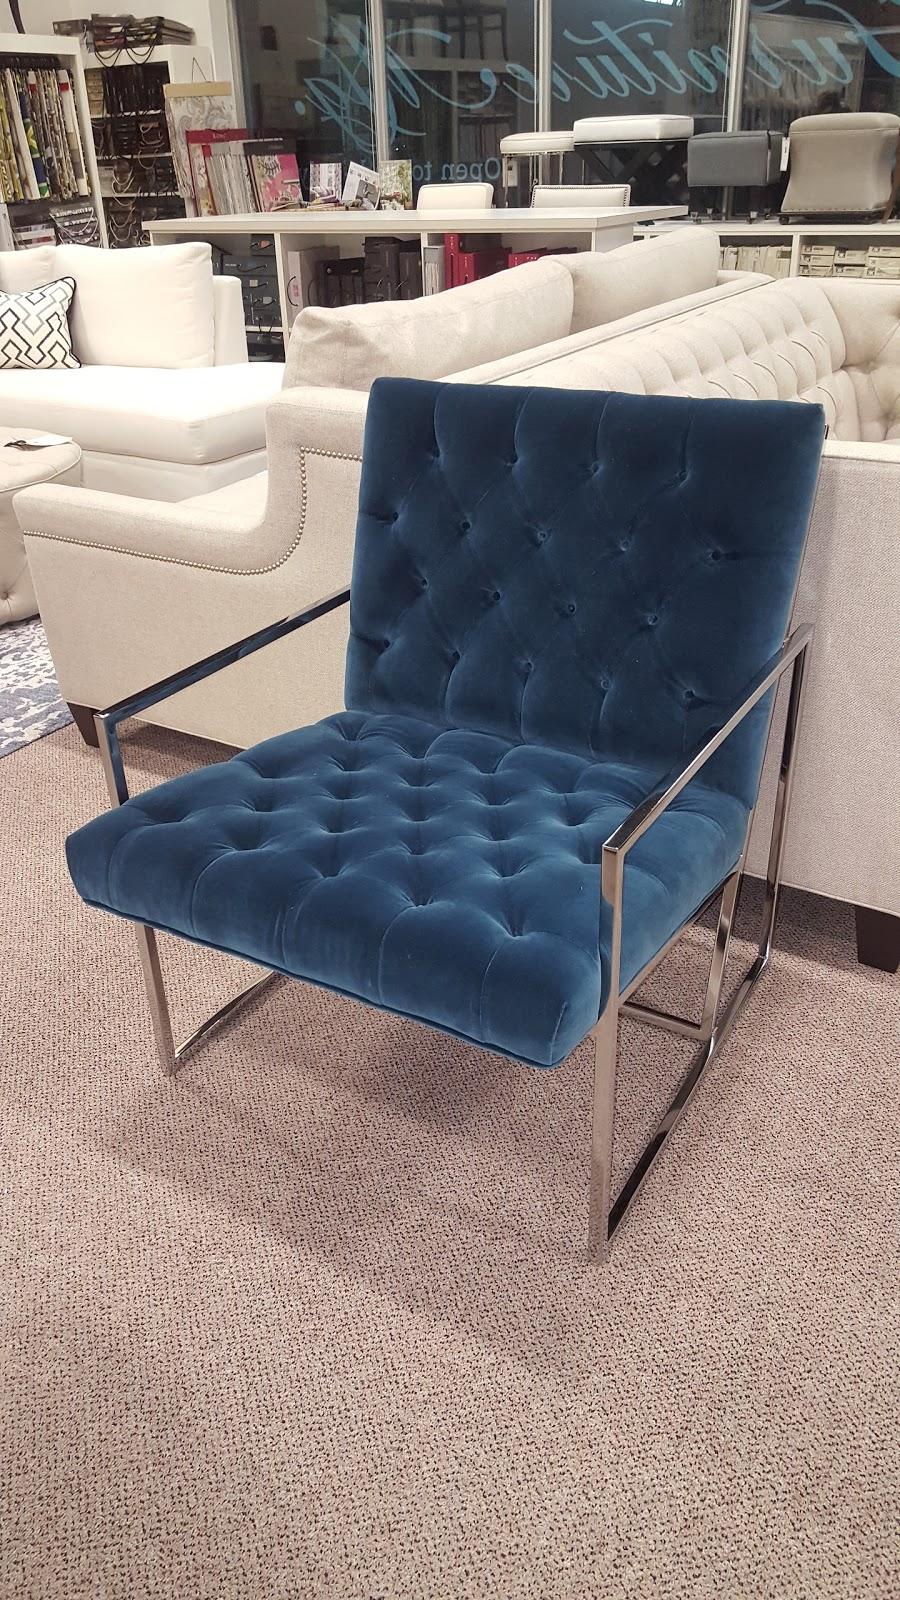 Gresham House Furniture   furniture store   3250 Ridgeway Dr #6, Mississauga, ON L5L 5Y6, Canada   9054120362 OR +1 905-412-0362